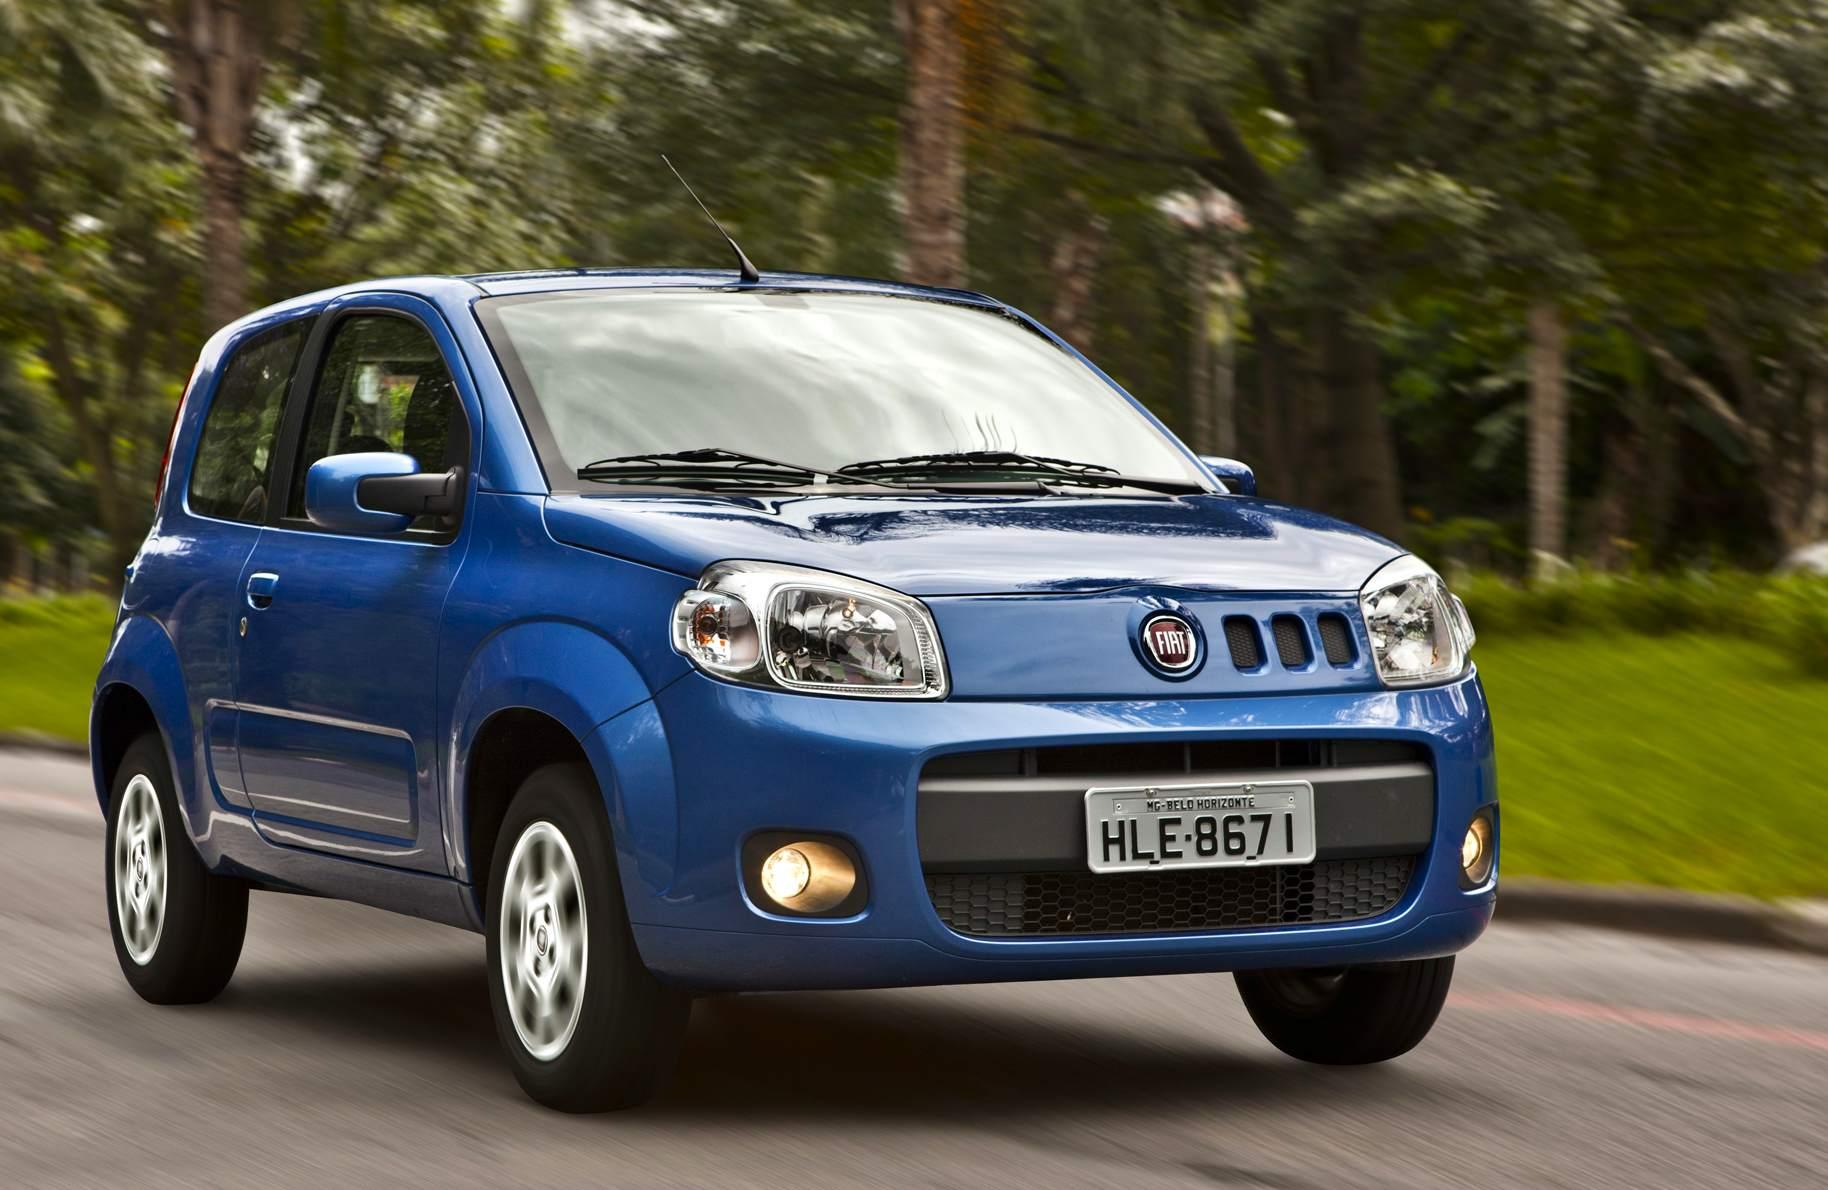 JAC | Best Selling Cars - Matt's blog